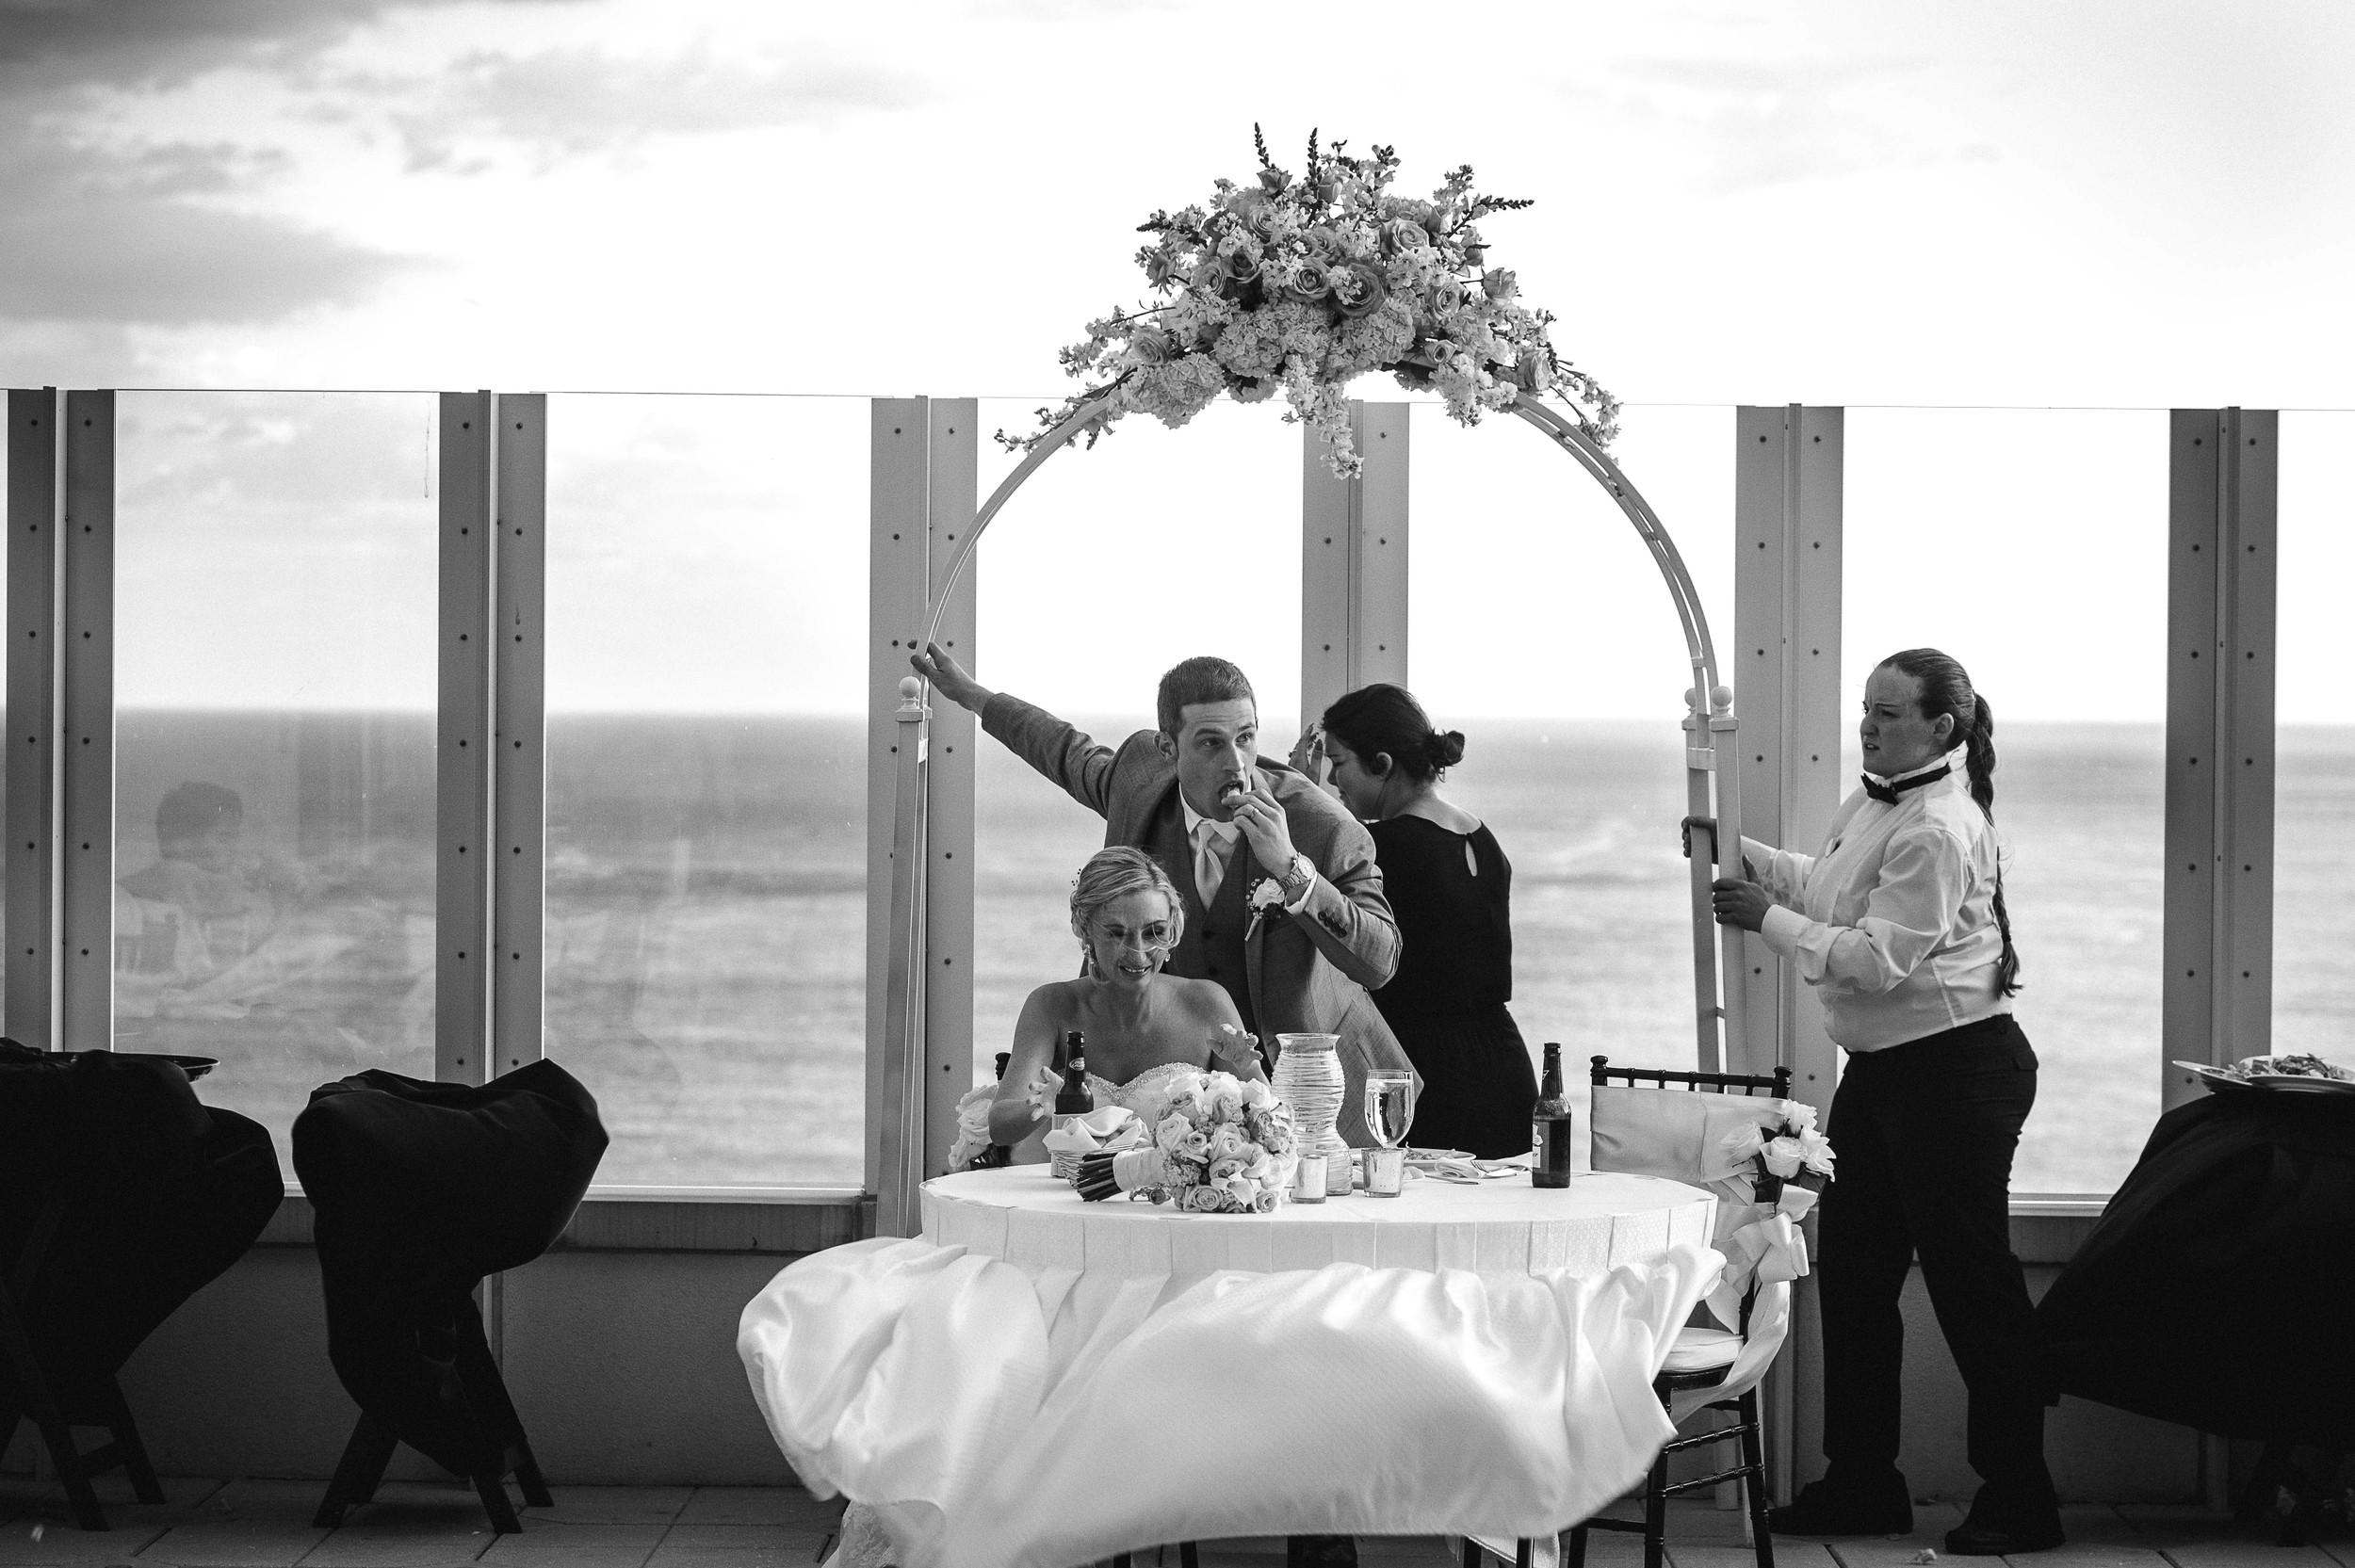 virginia-beach-wedding-photographer-melissa-bliss-photography-documentary-wedding-photography-norfolk-wedding-photographer